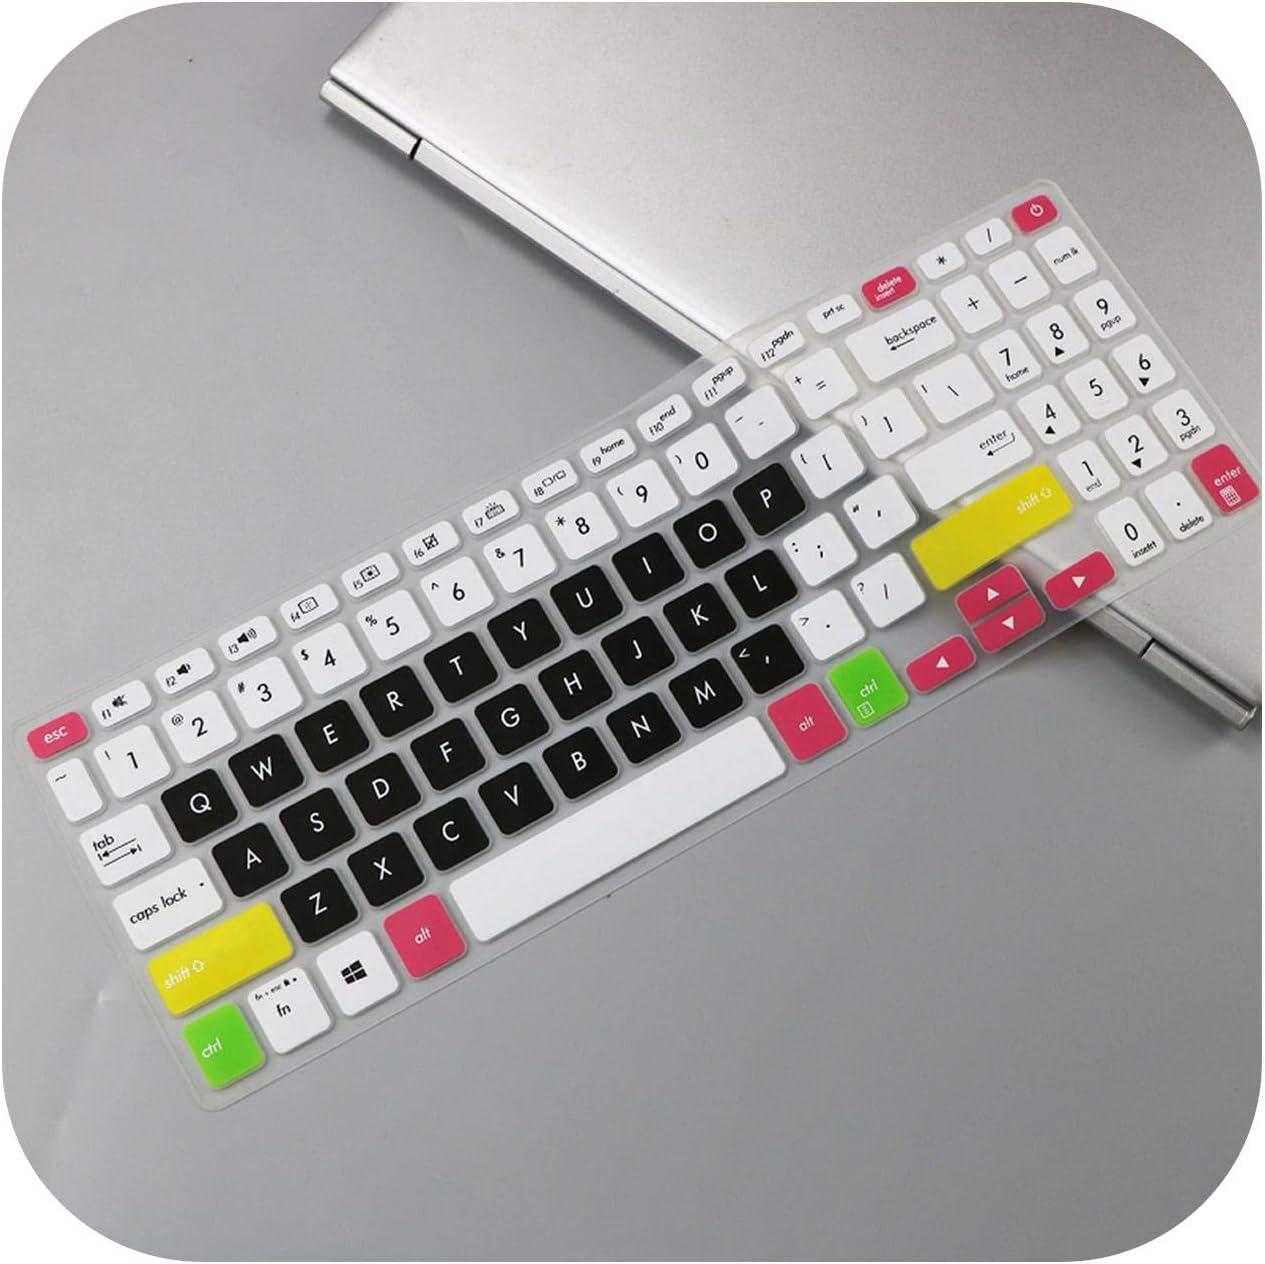 for Asus Vivobook S15 s530un S530F S530FN s530ua s530UF s530fa S530U S530 UN UA 15.6 inch Keyboard Protector Skin Cover-candyblack